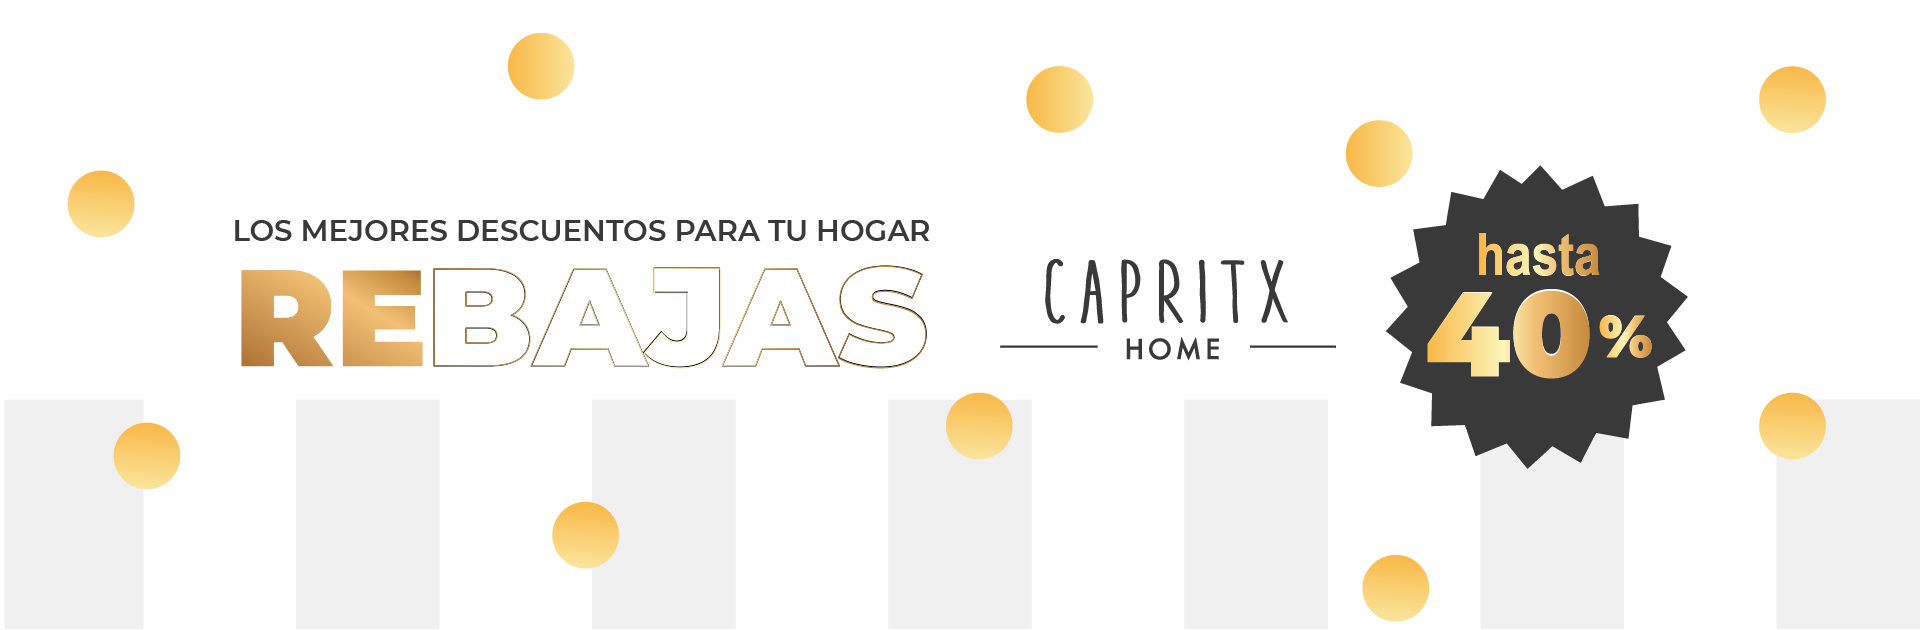 capritx_banner-web_rebajas-enero-21_851x360_291220B